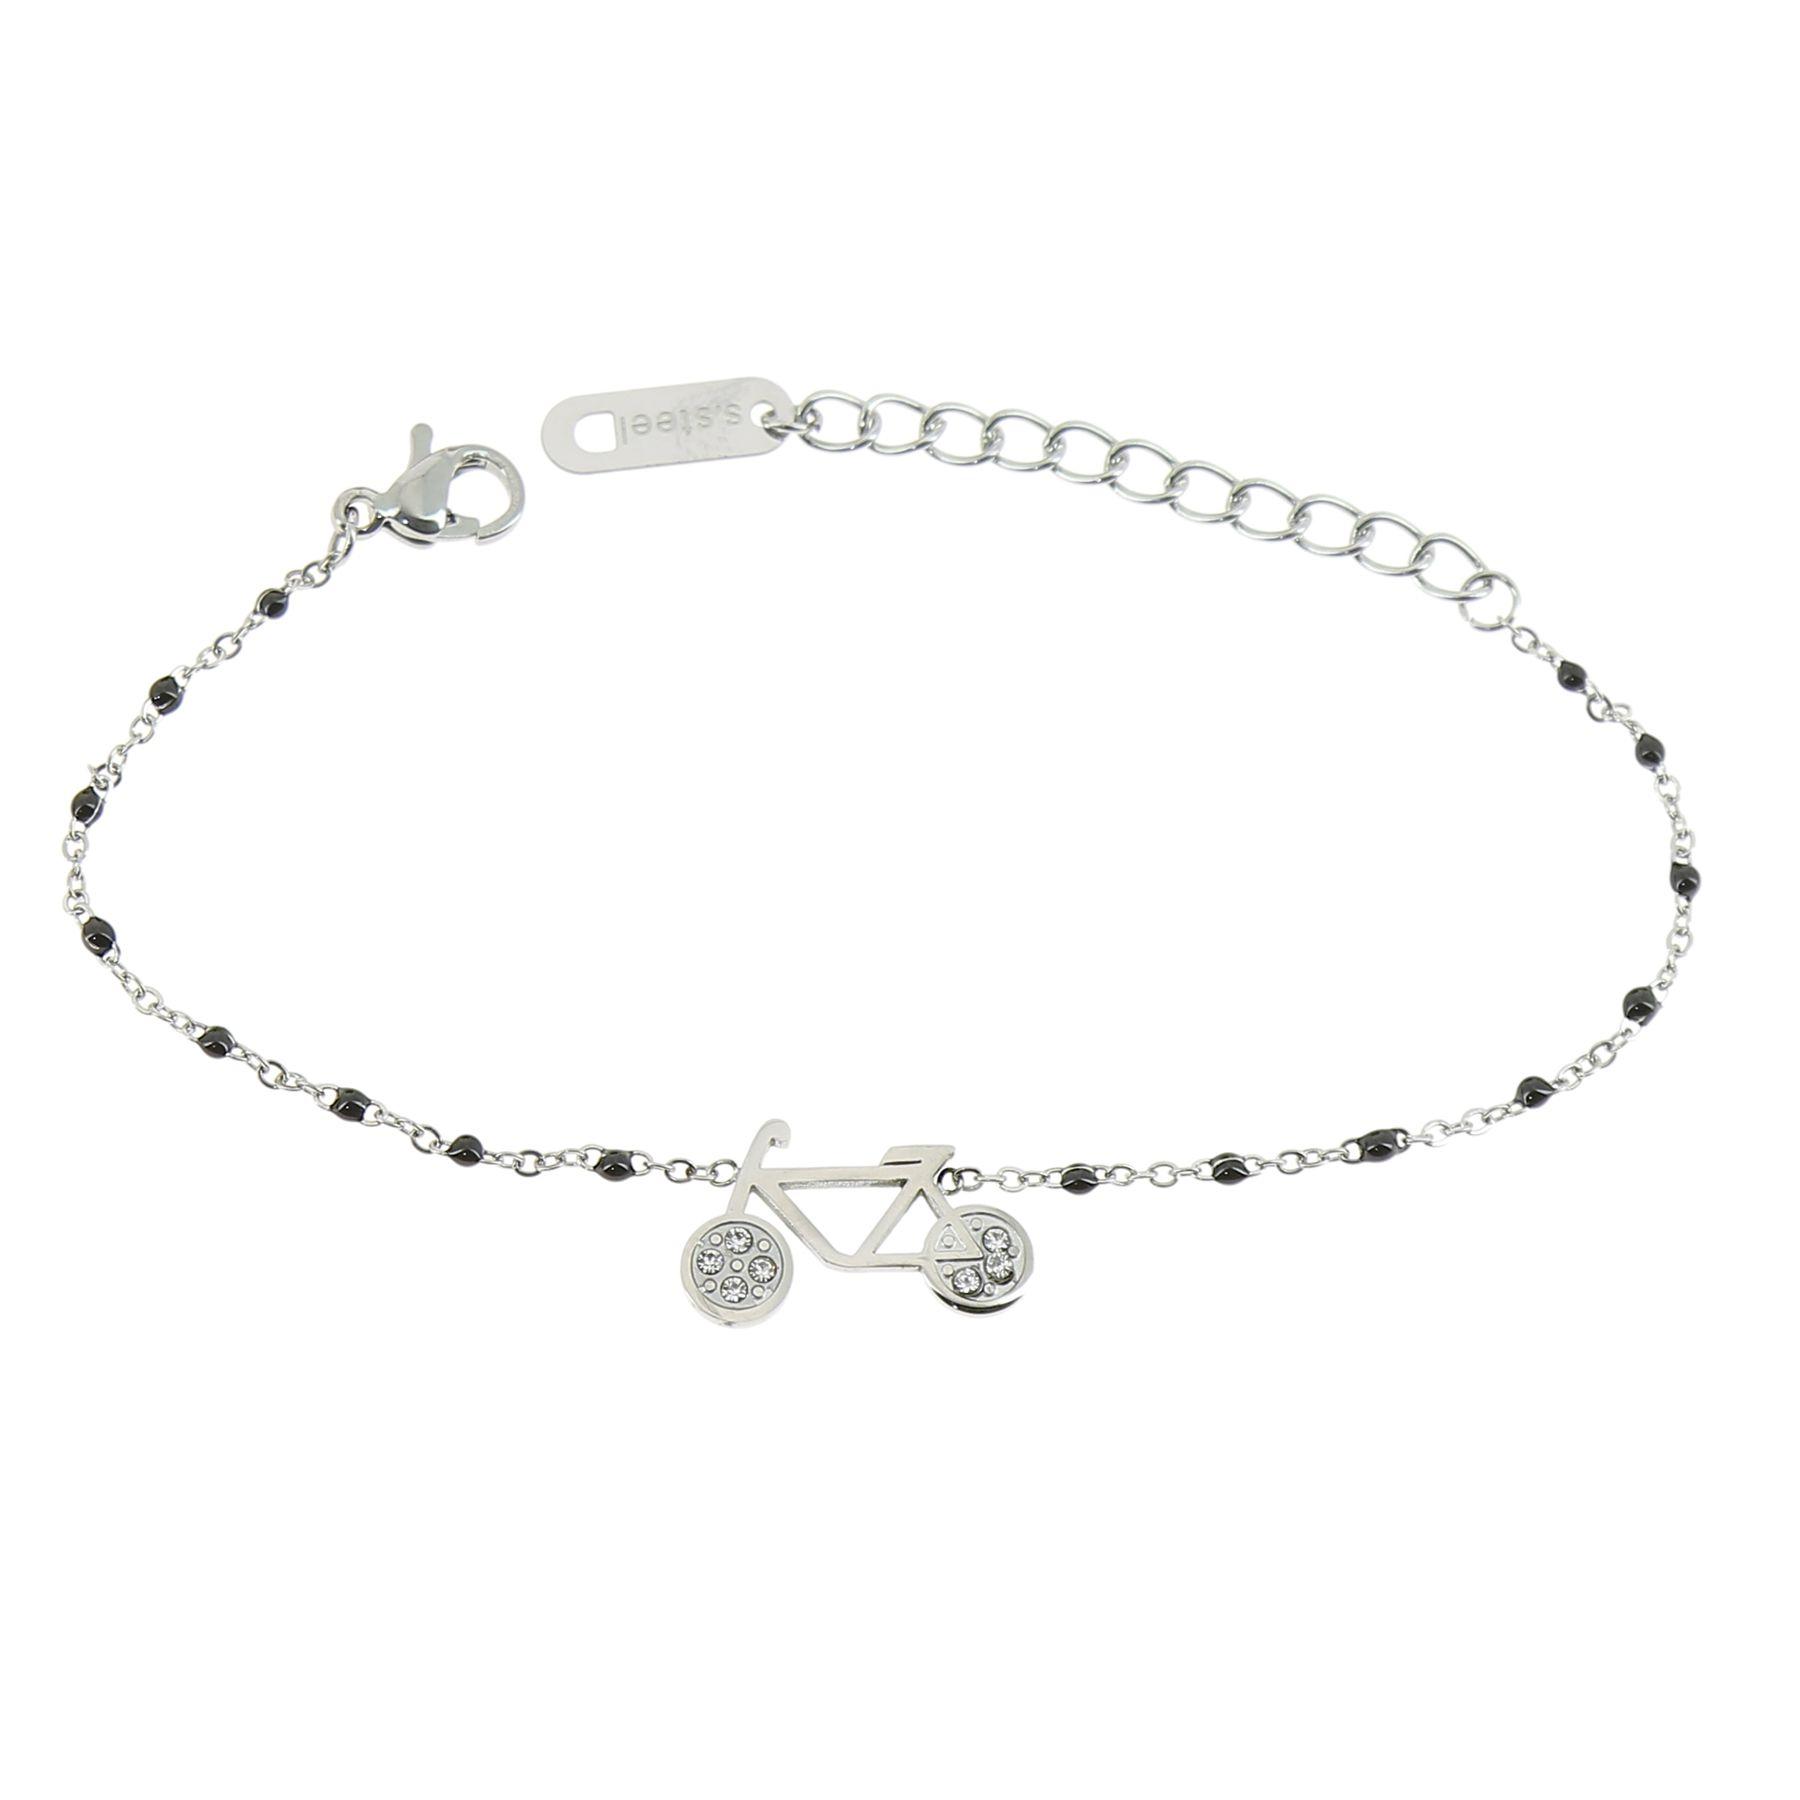 d41cf5b9c16bf Bracelet femme acier inoxydable adjustable strass perle ASHLEY. Loading zoom